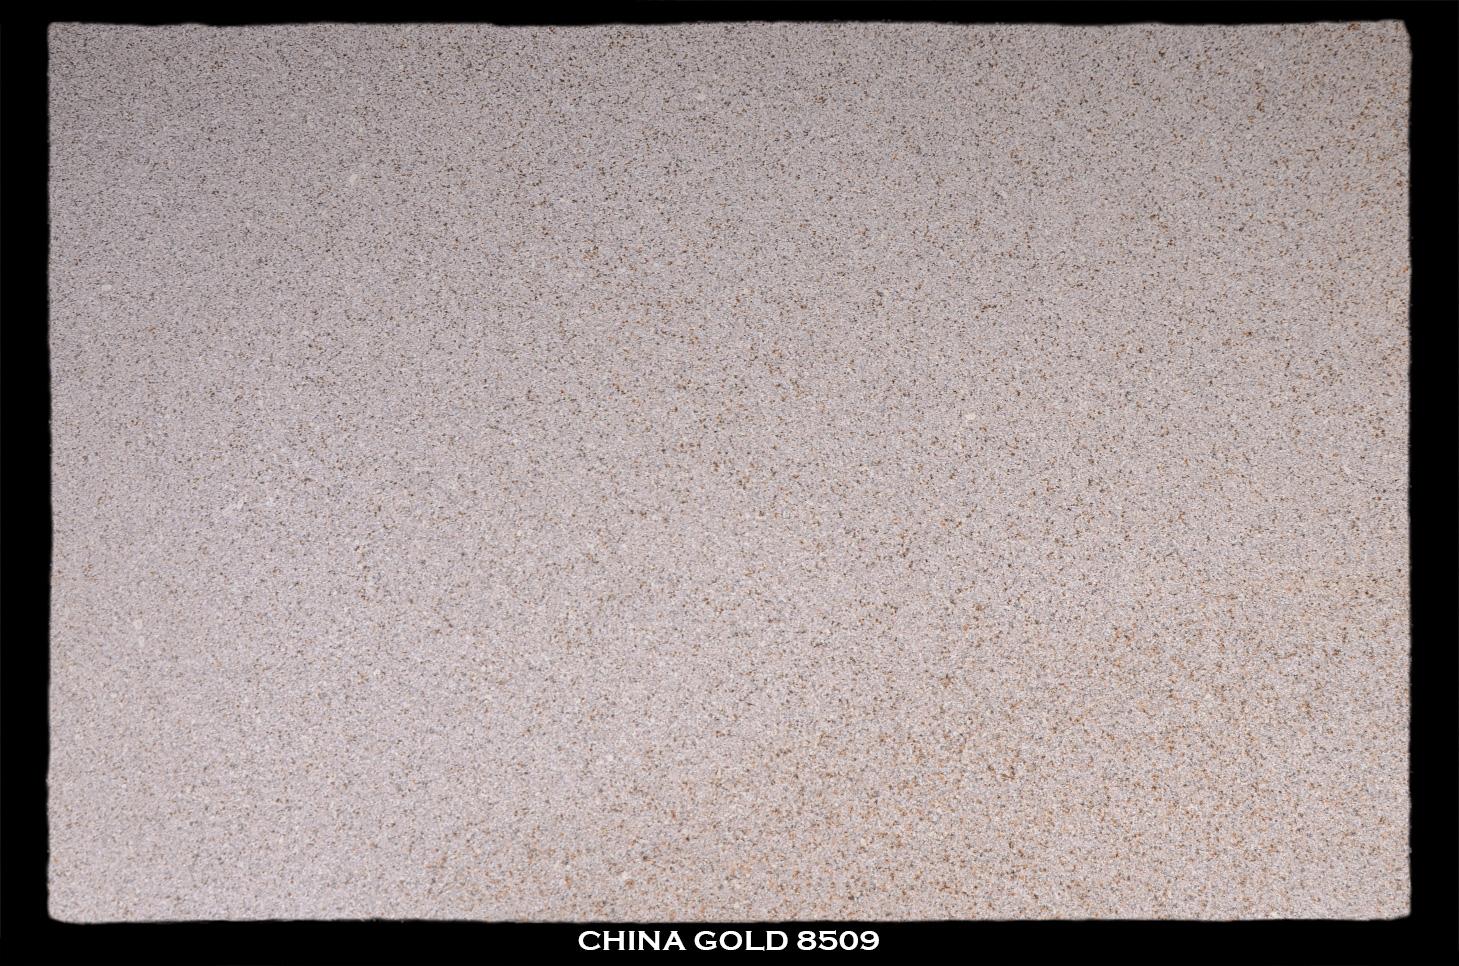 CHINA-GOLD-8509-SLAB